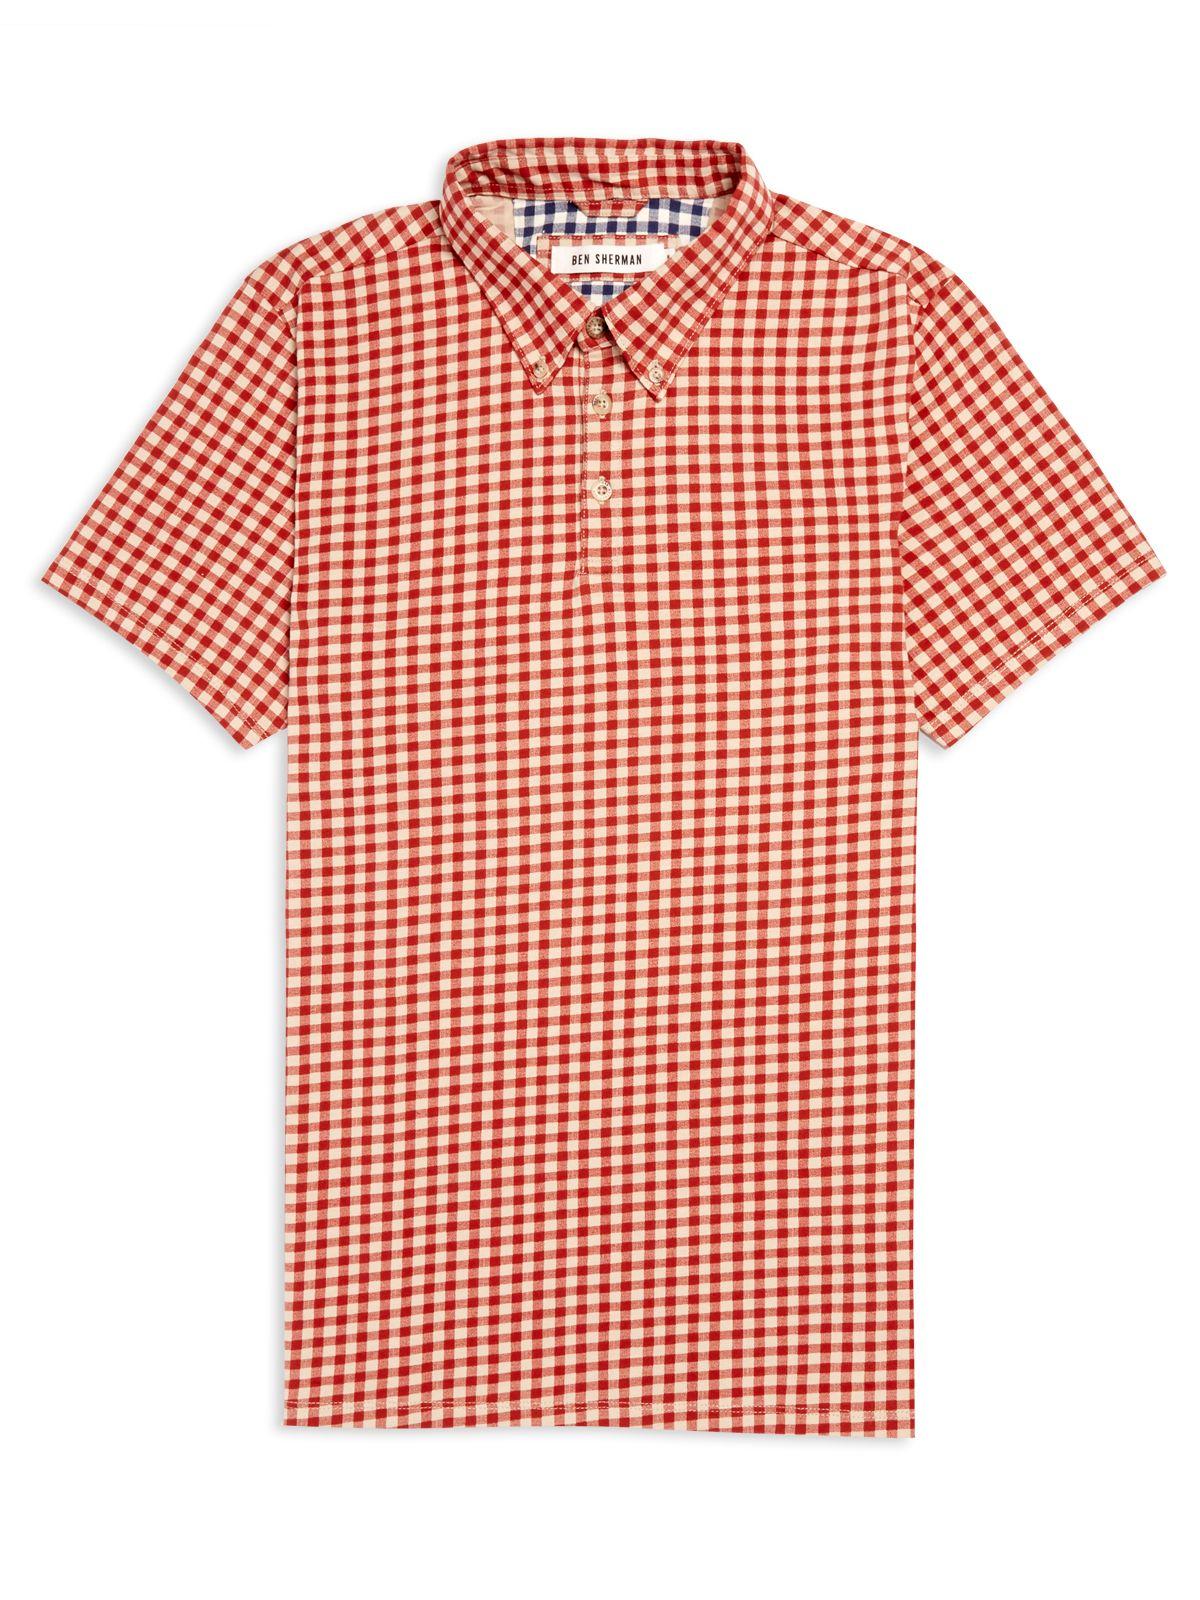 Ben Sherman Gingham Print Polo Shirt In Red For Men Dark